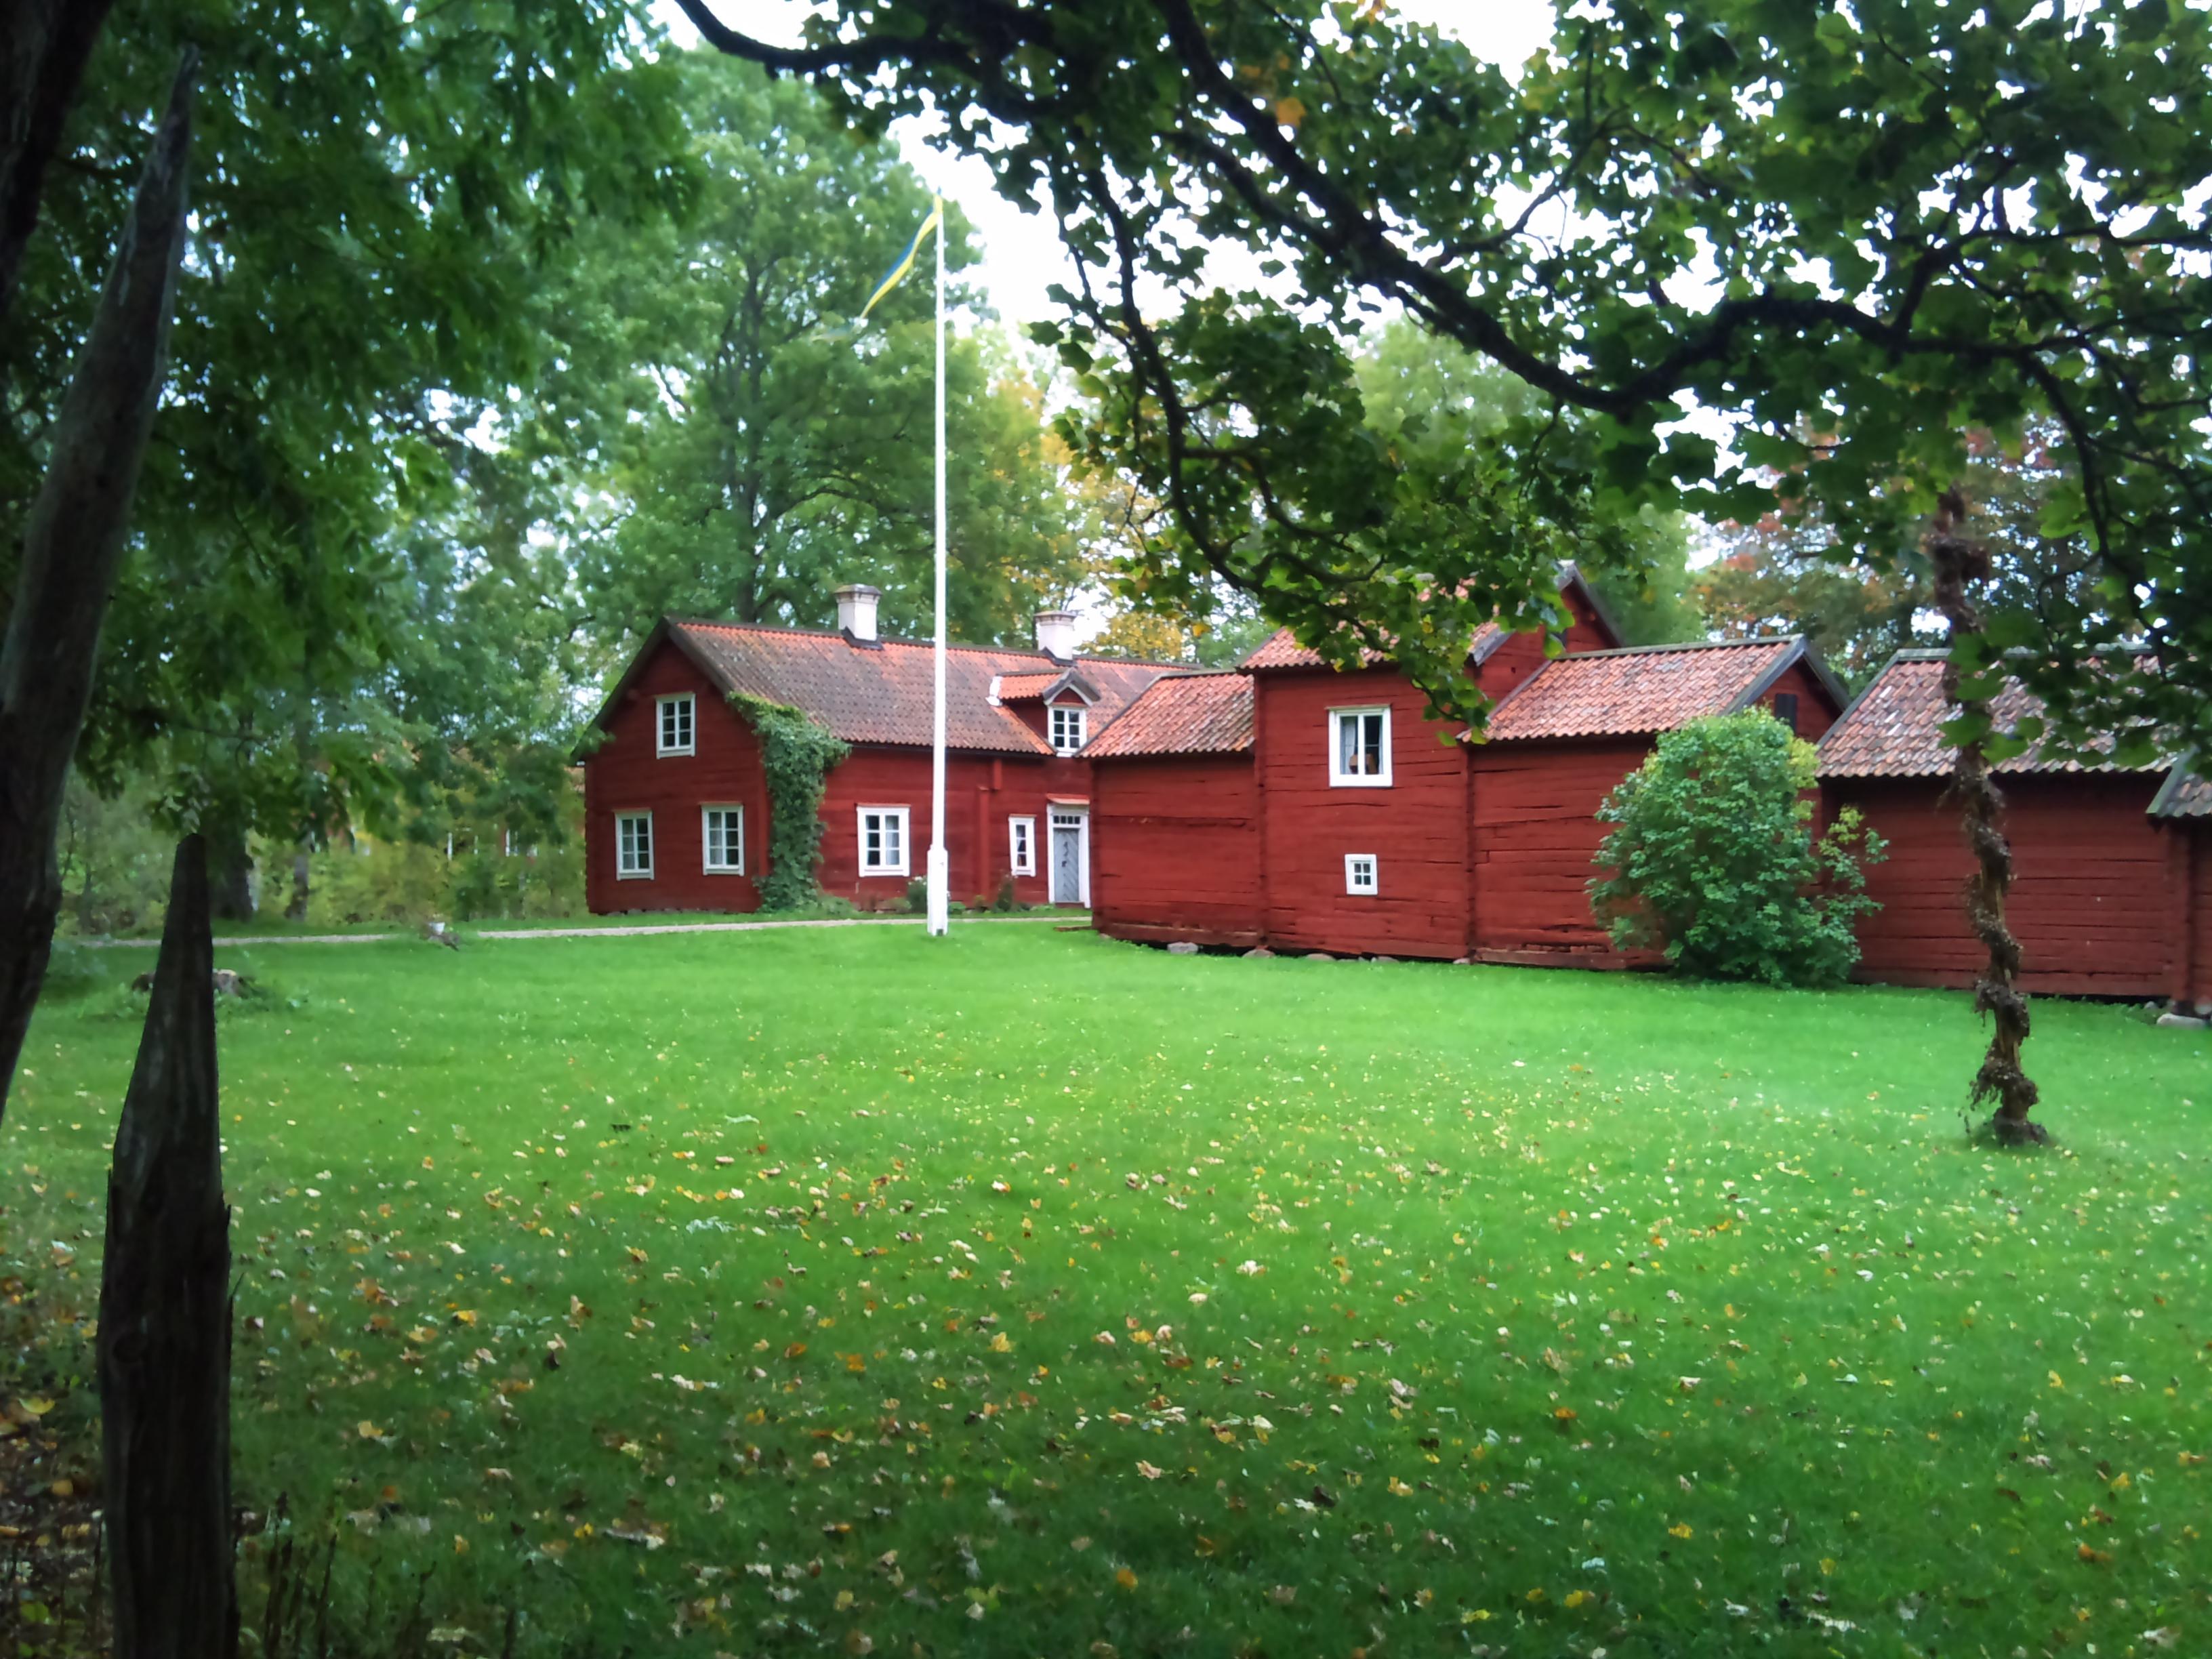 Vy ver Skuttunge-Brunnby 2:1, Skuttunge socken, Uppland